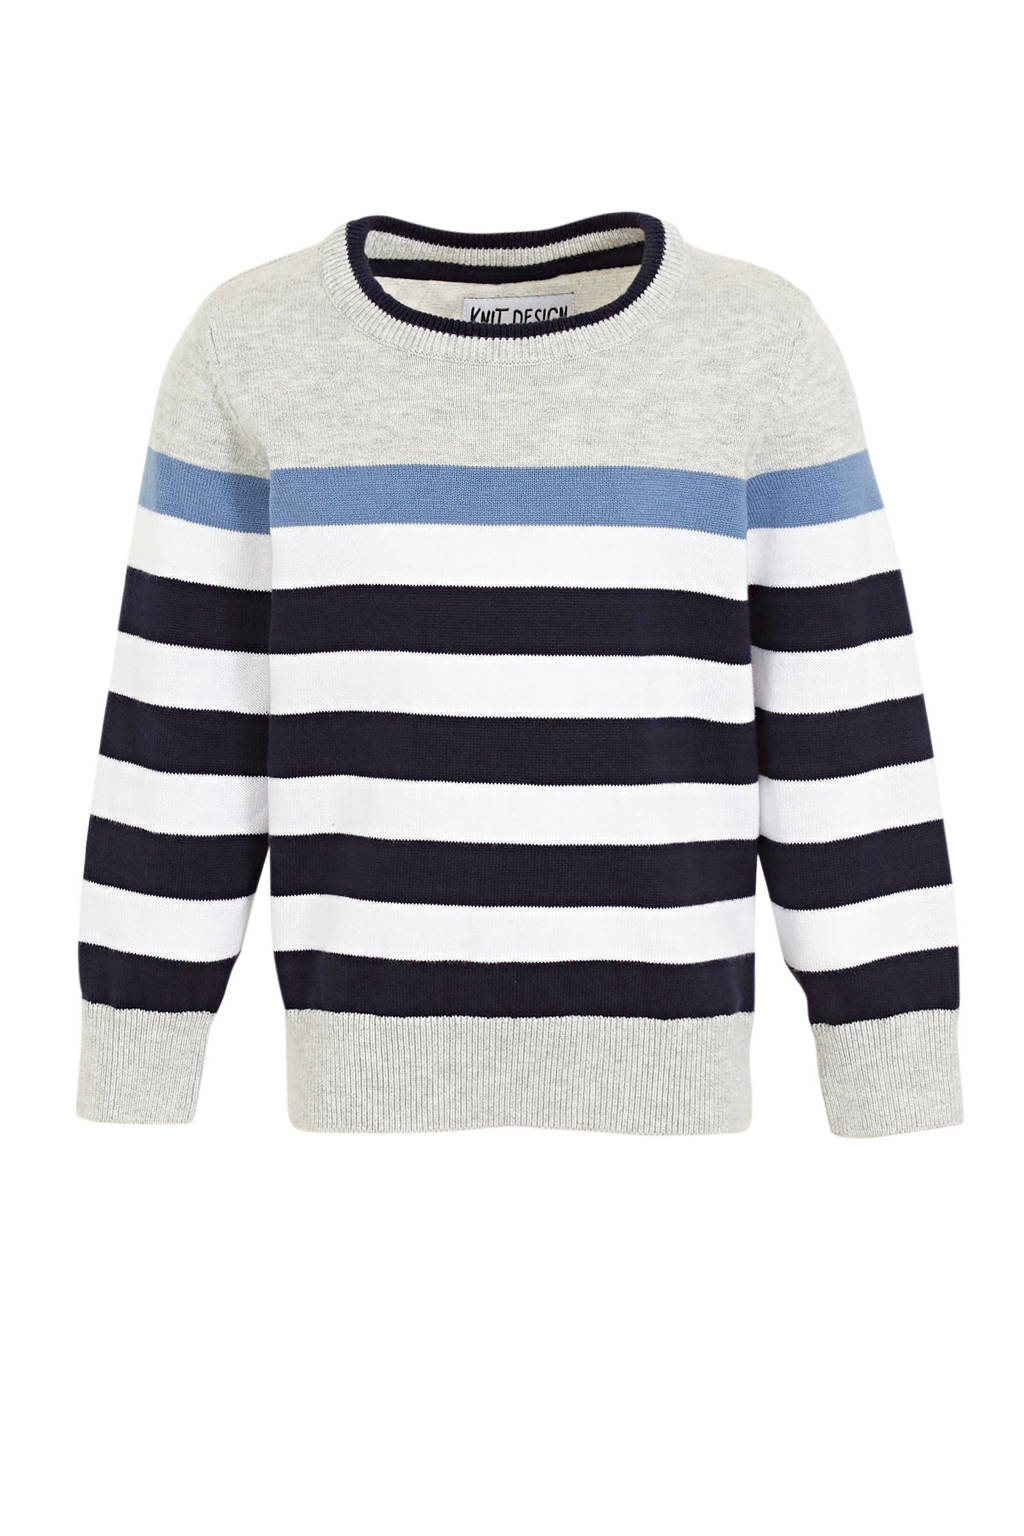 C&A gestreepte trui lichtgrijs melange/donkerblauw/wit, Lichtgrijs melange/donkerblauw/wit